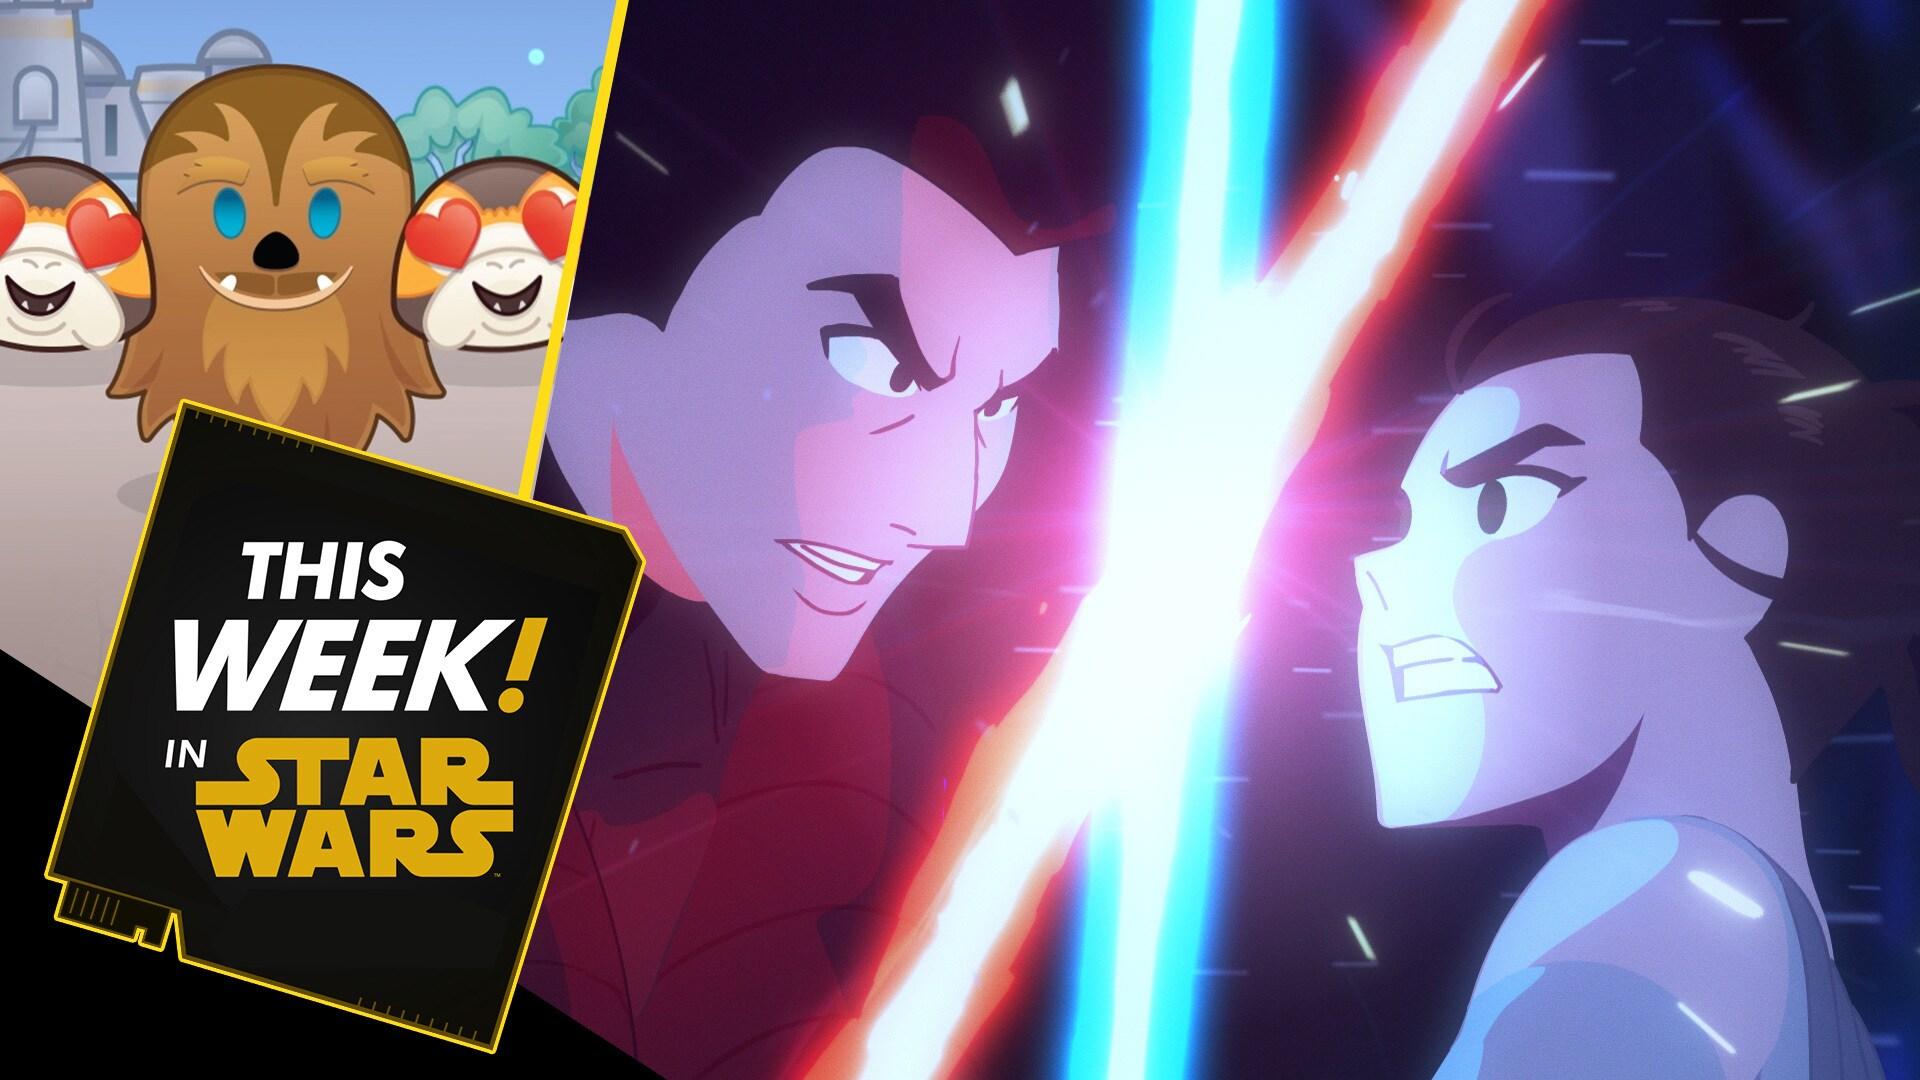 New Star Wars Galaxy of Adventures, Wookiee Hugs in Disney Emoji Blitz, and More!